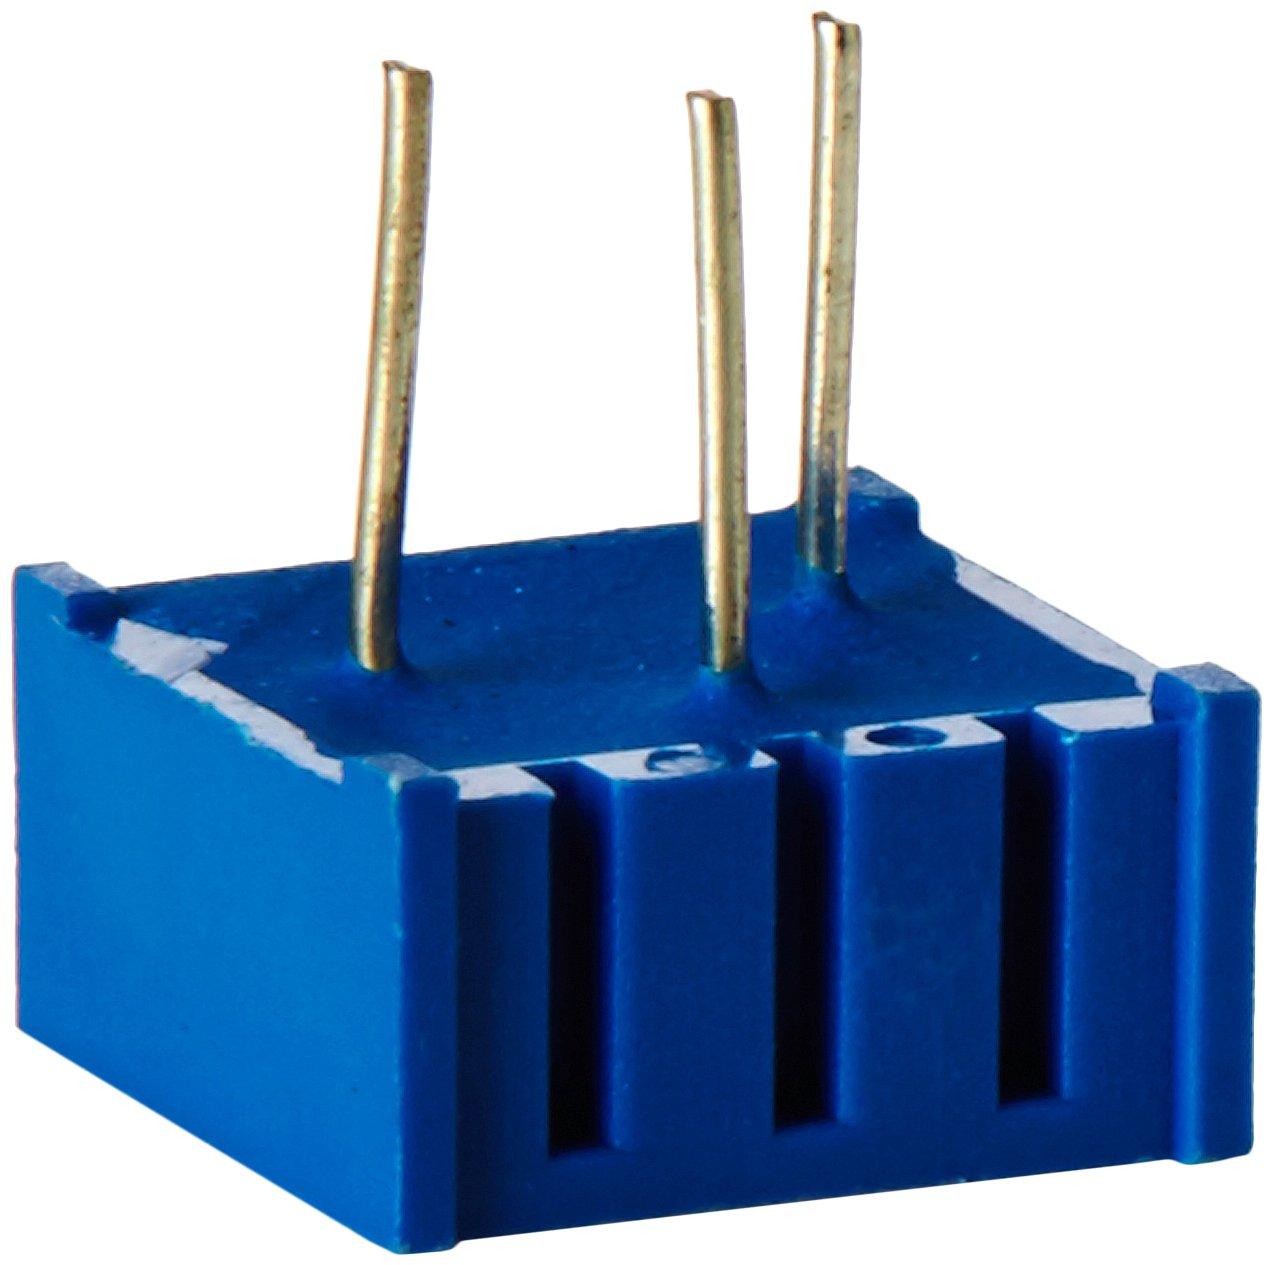 10 Pcs 10K Ohm Top Adjustment Variable Resistors Potentiometer